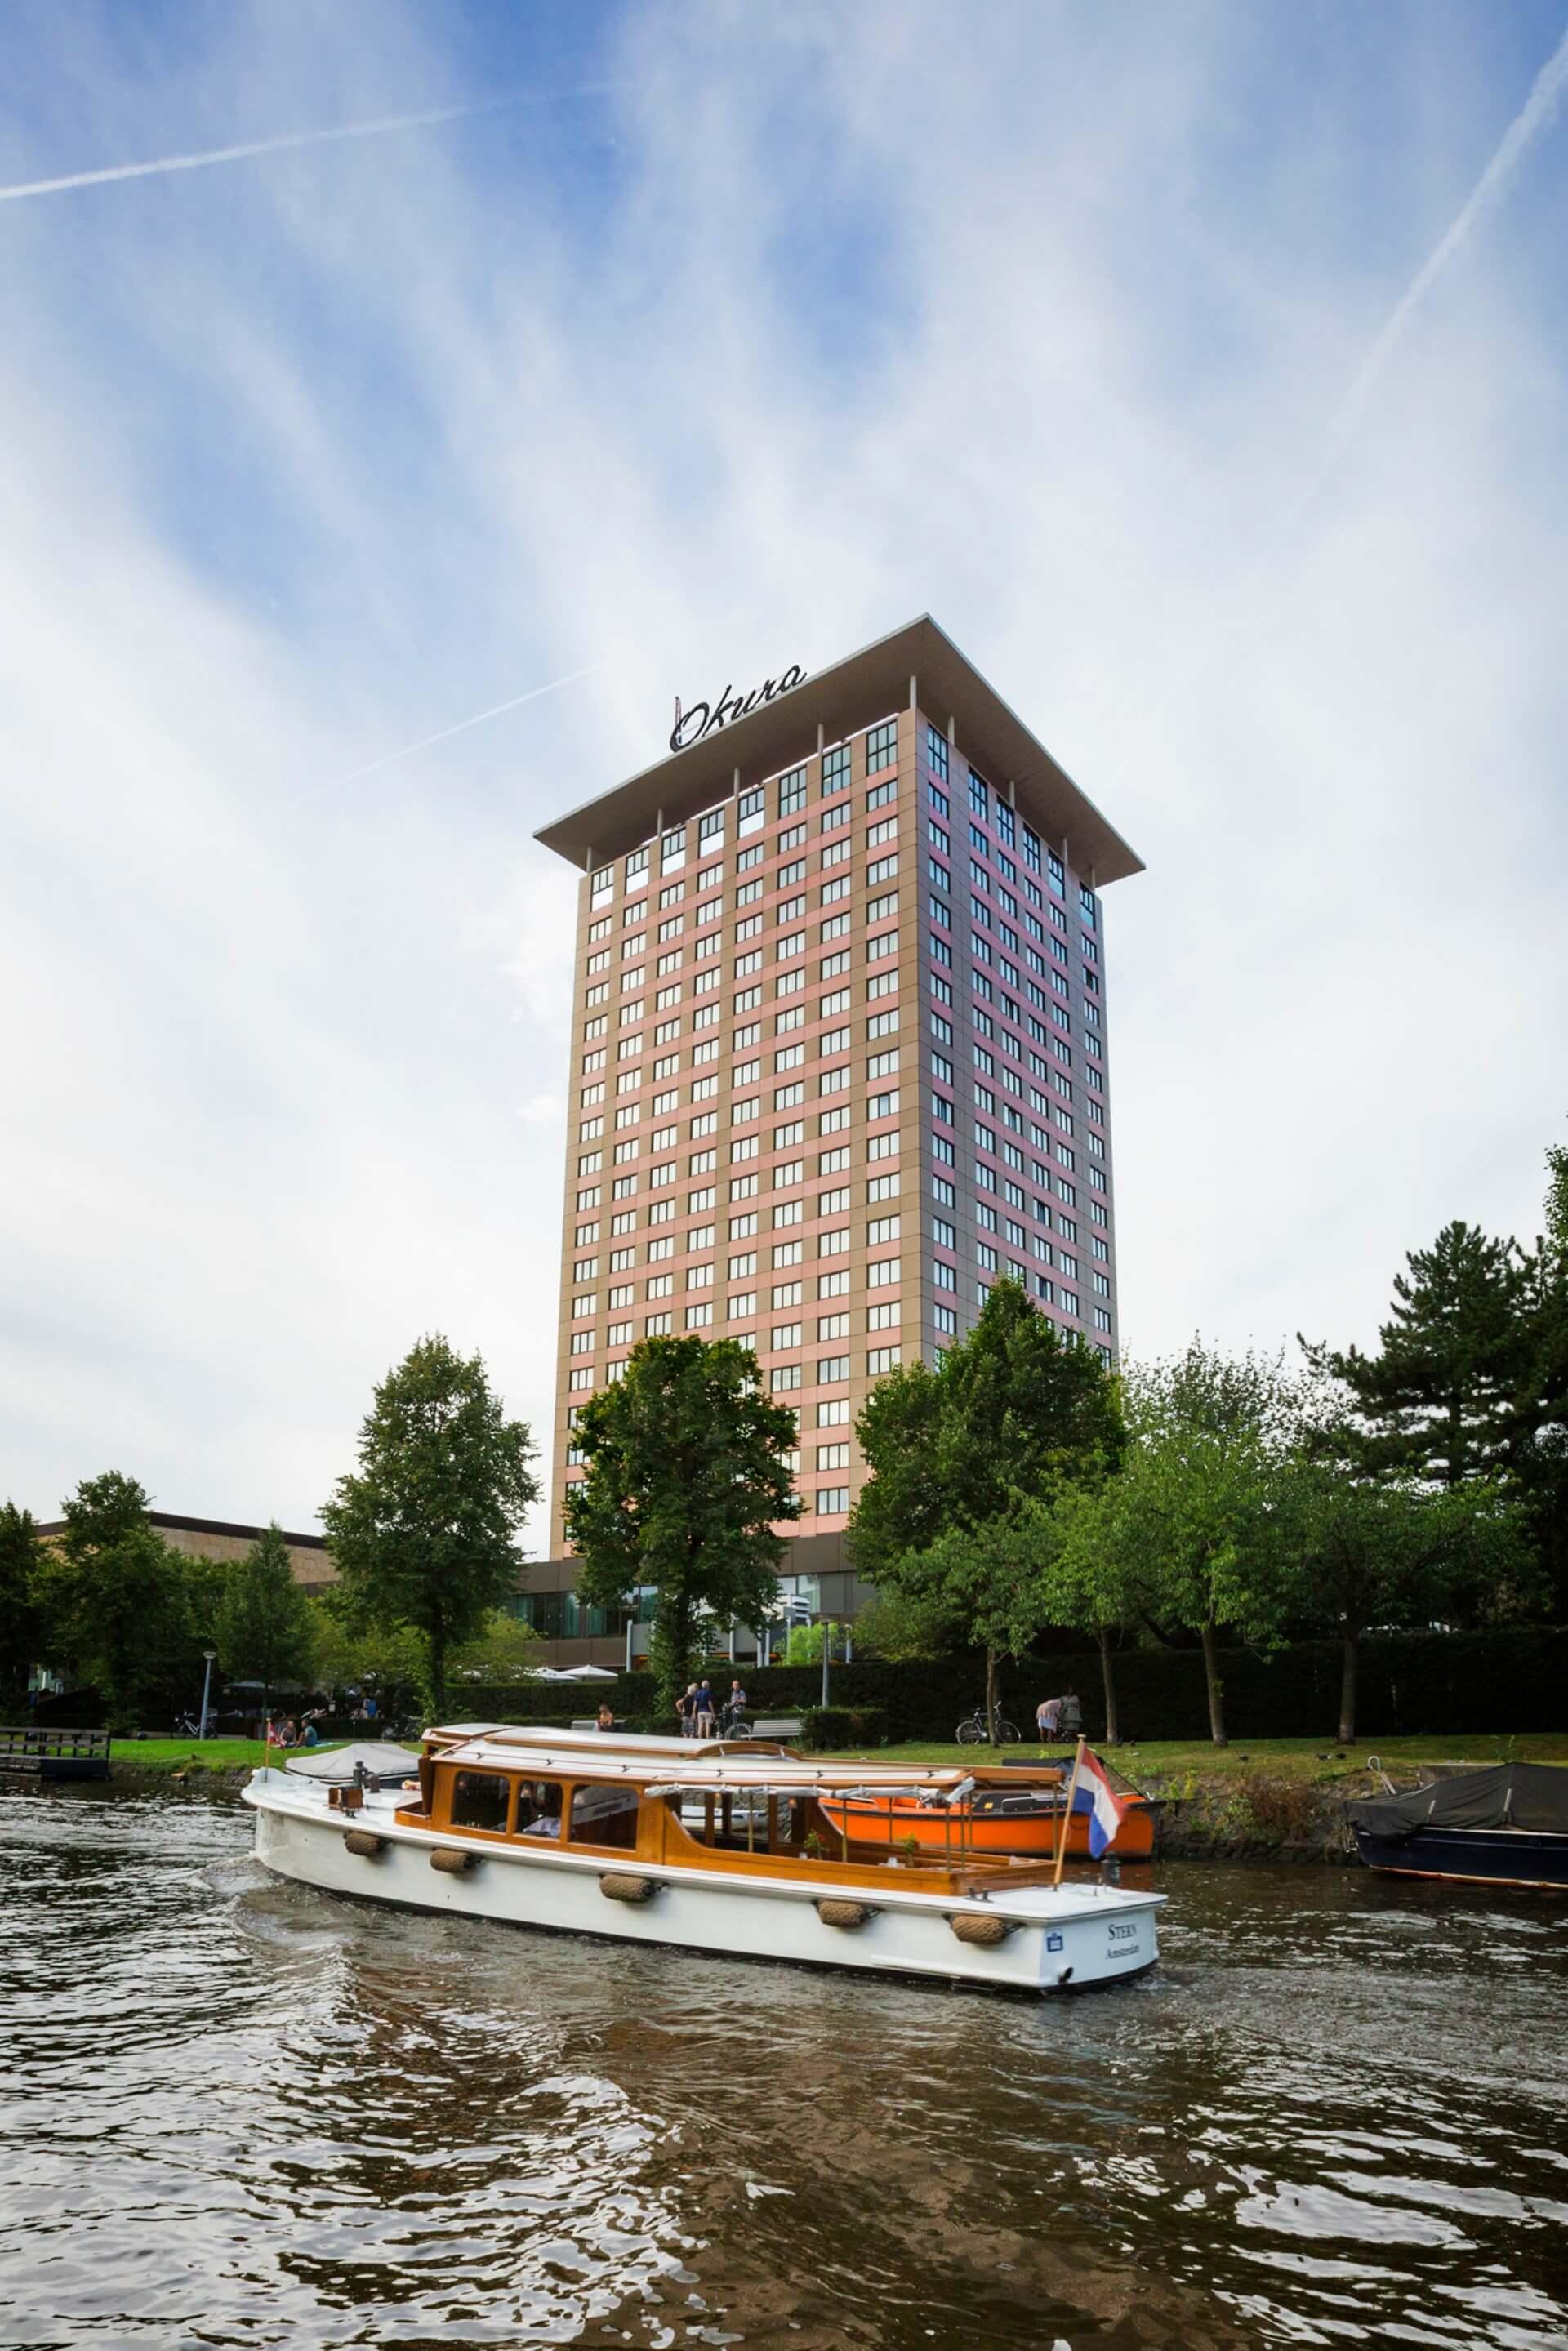 Hotel Okura Amsterdam exterior